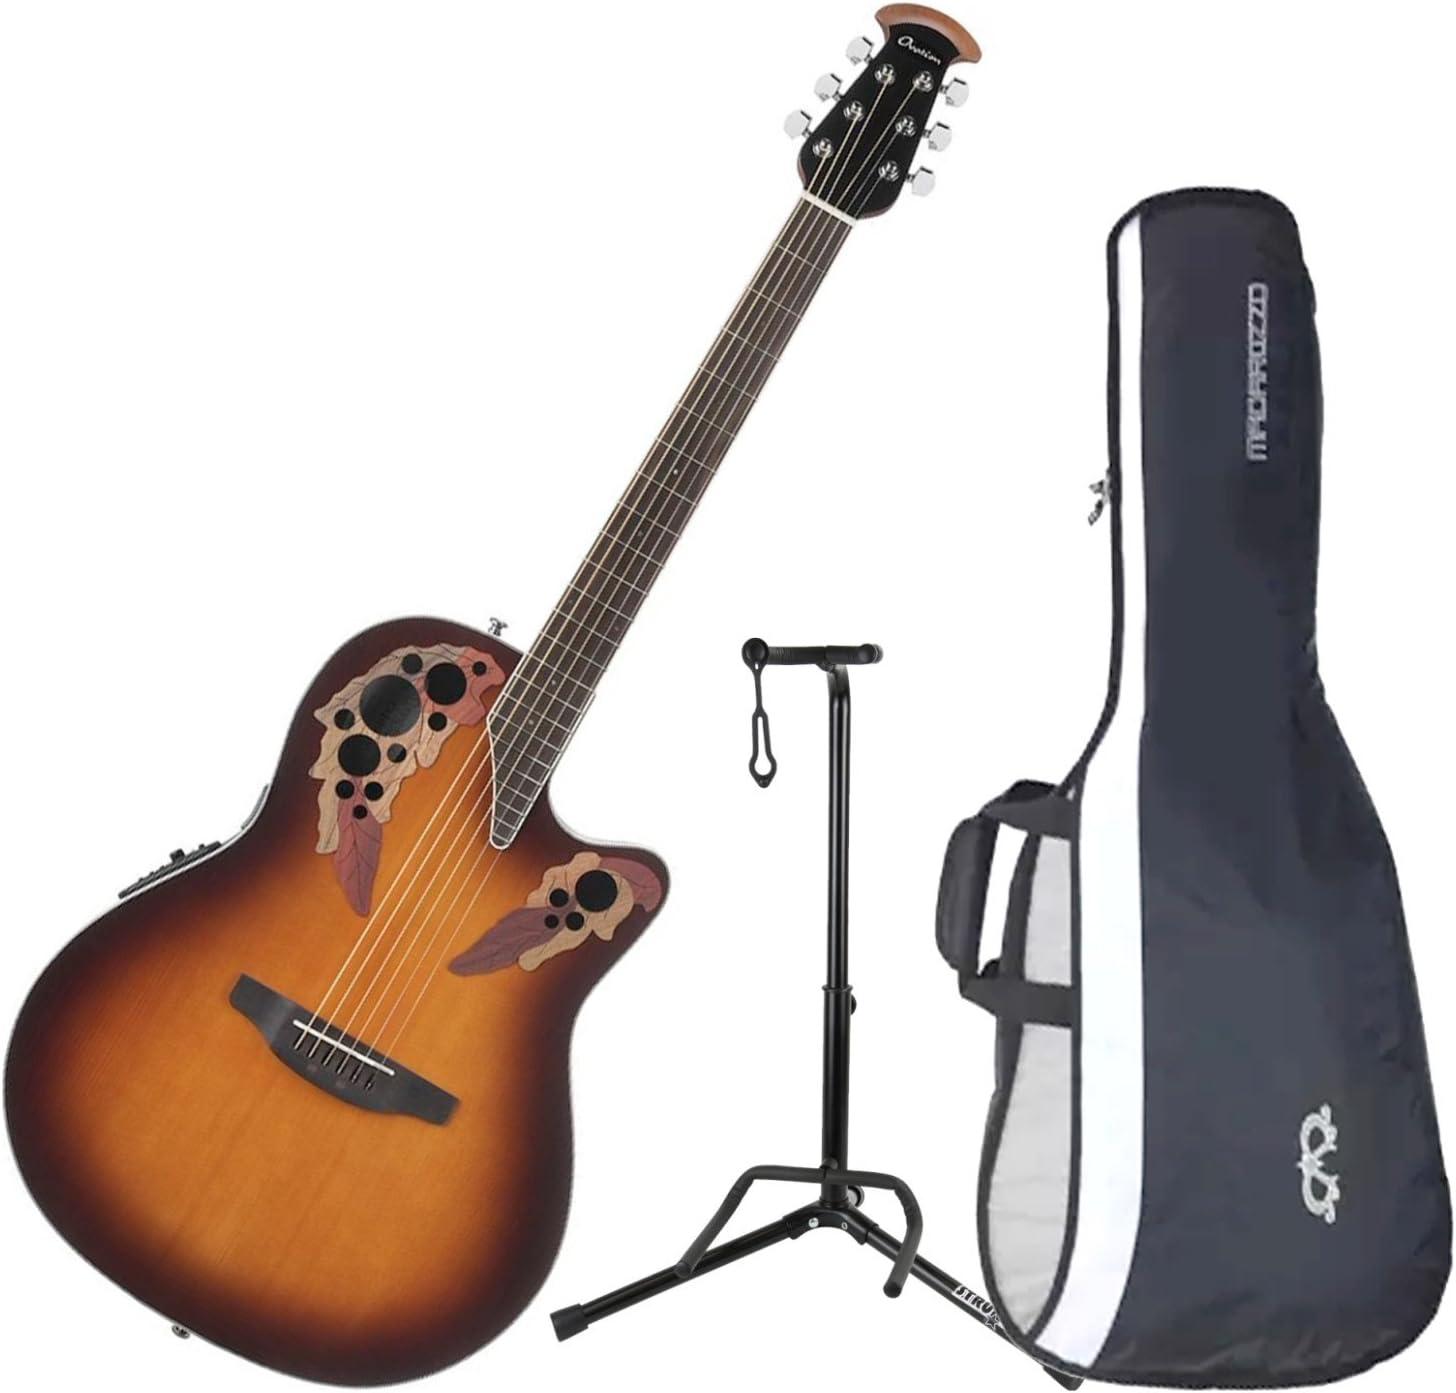 Ovation CE48 – 1 Celebrity Elite Super Shallow Sunburst guitarra ...